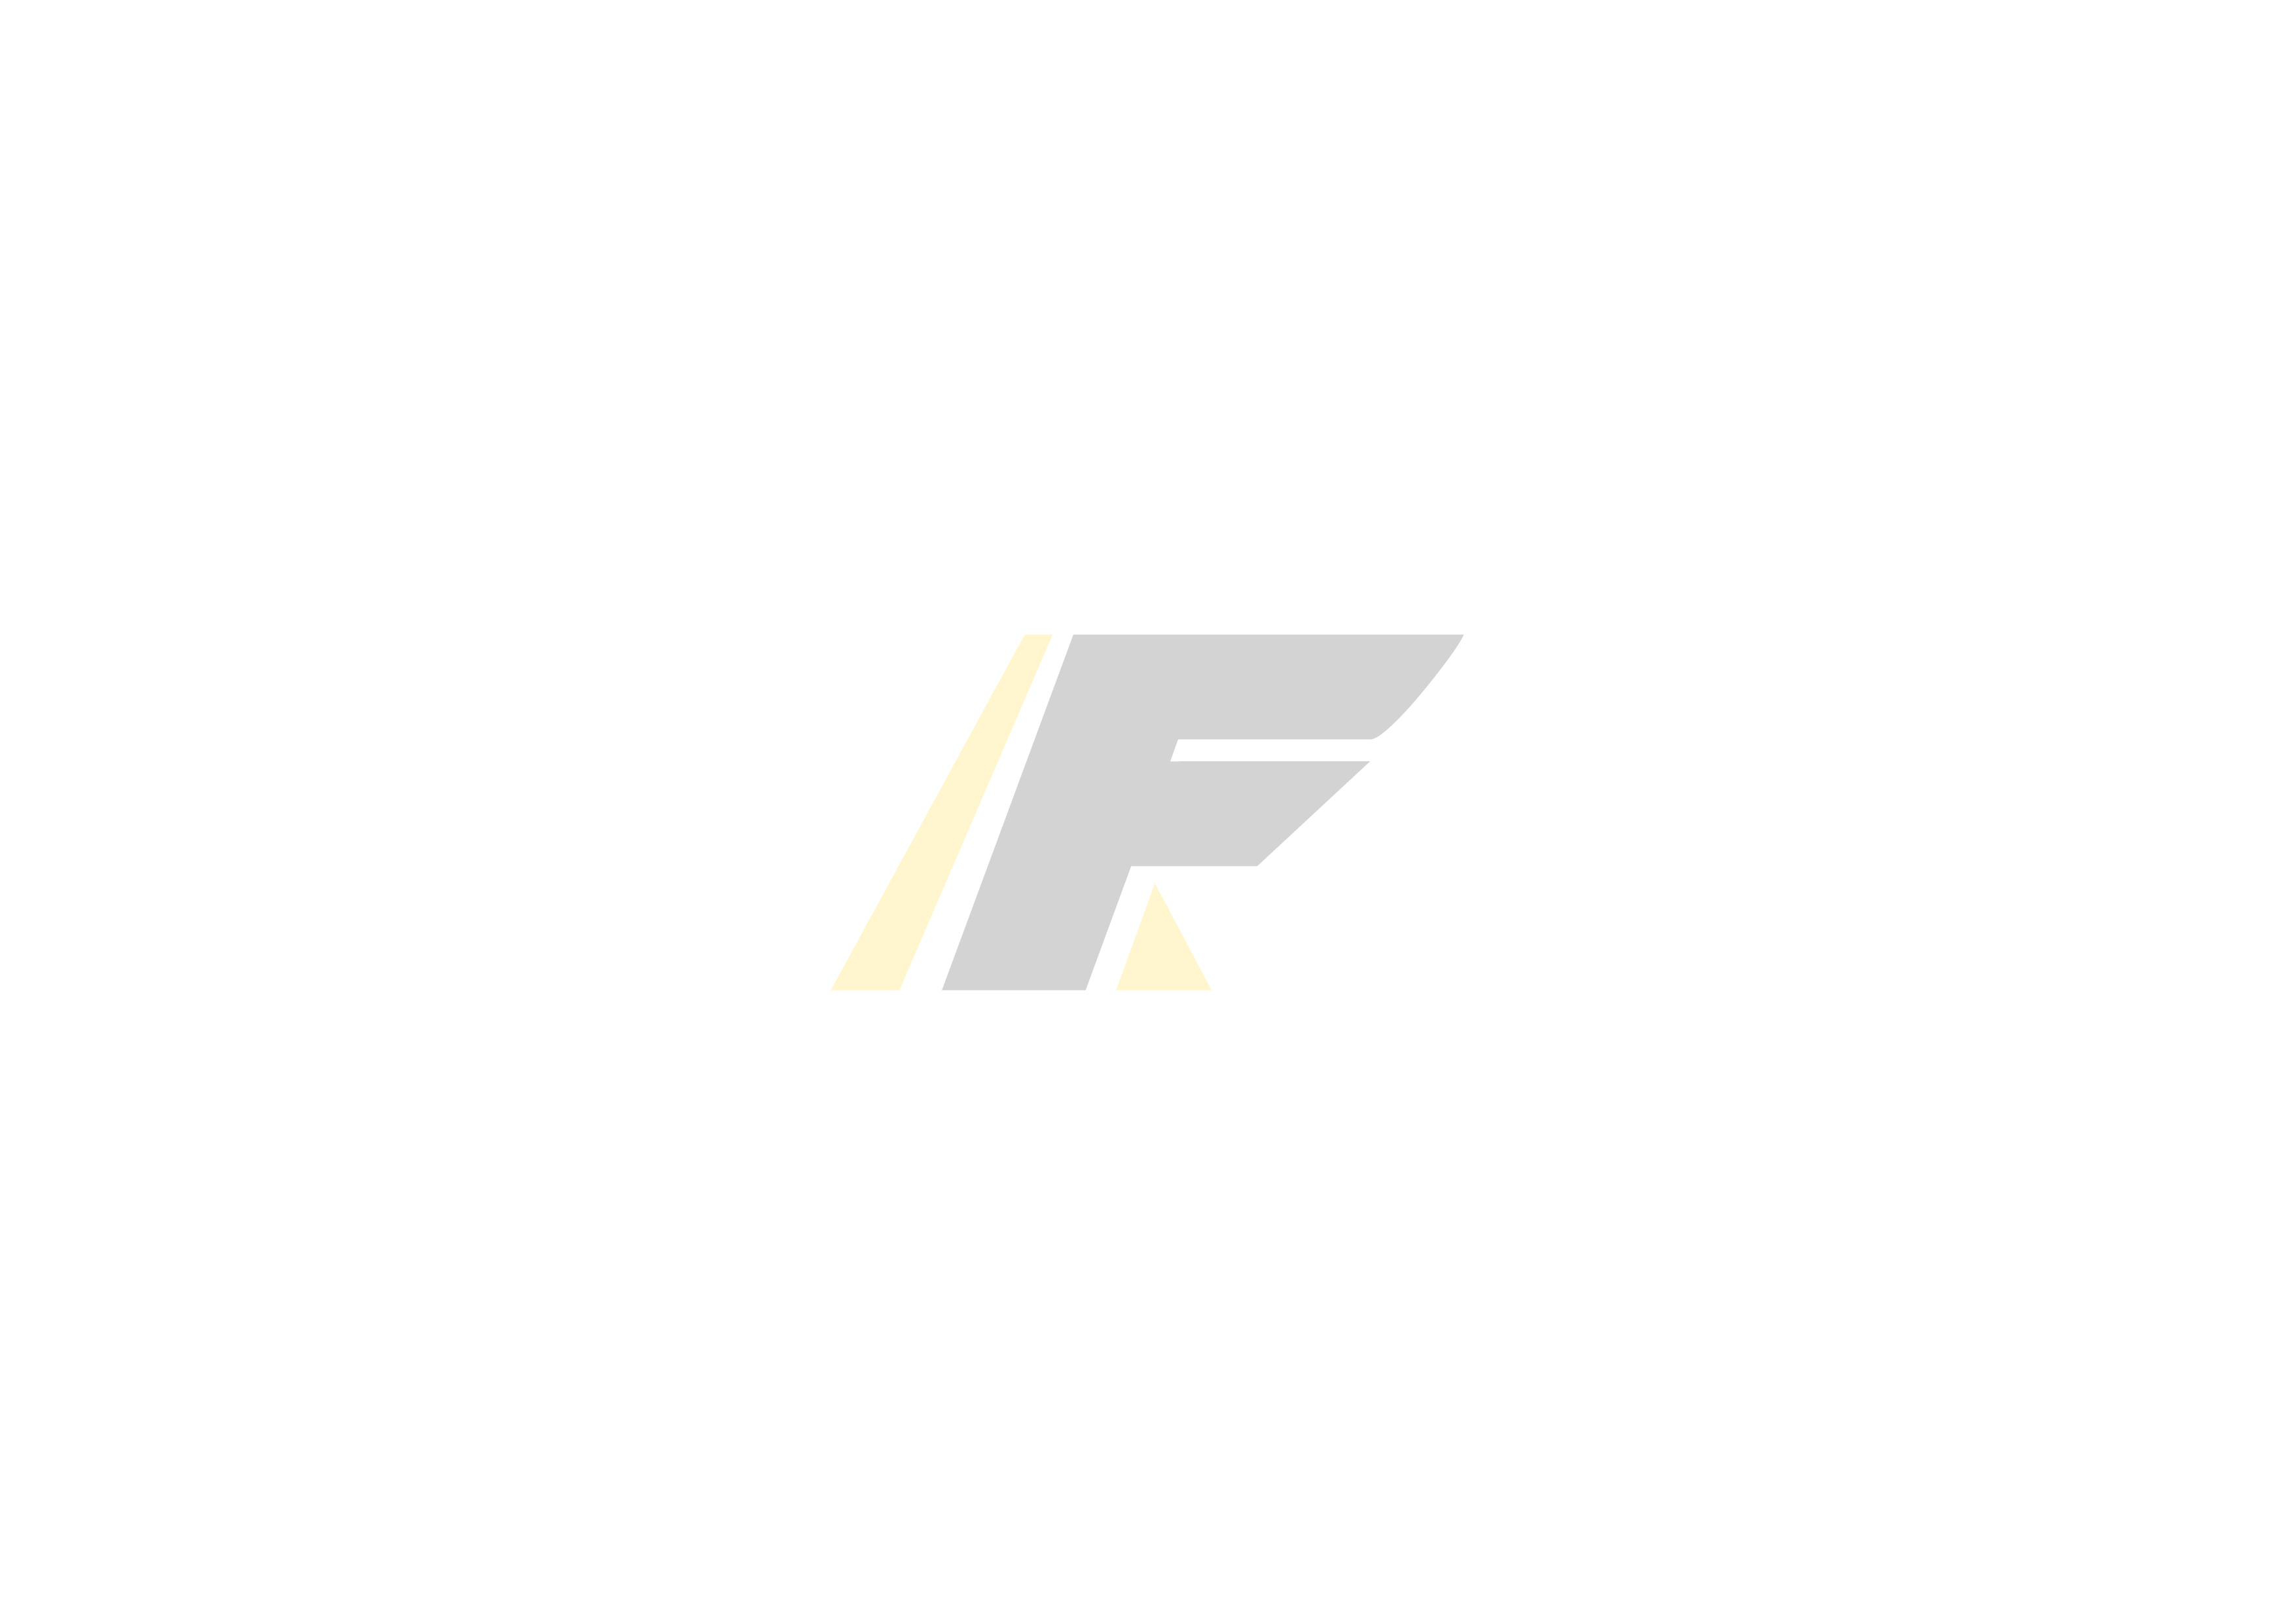 Dunlop - KT331 Quad Competition Radial